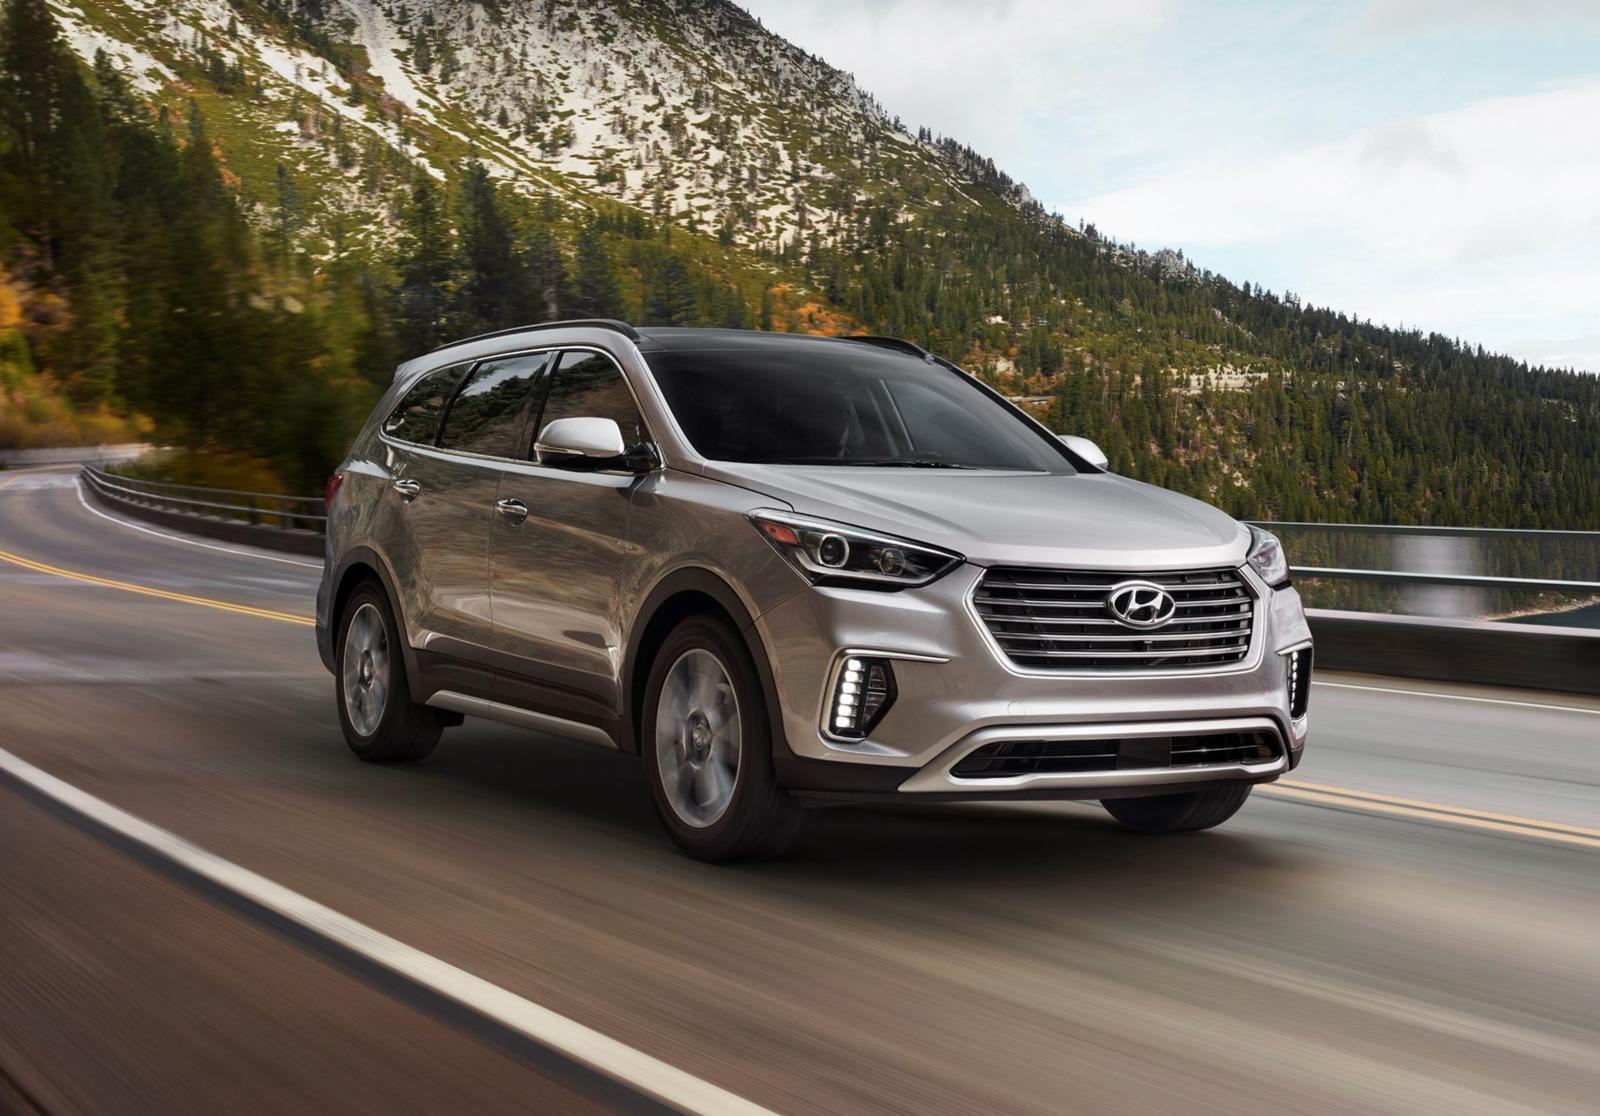 2019 Hyundai Santa Fe XL - Overview - CarGurus